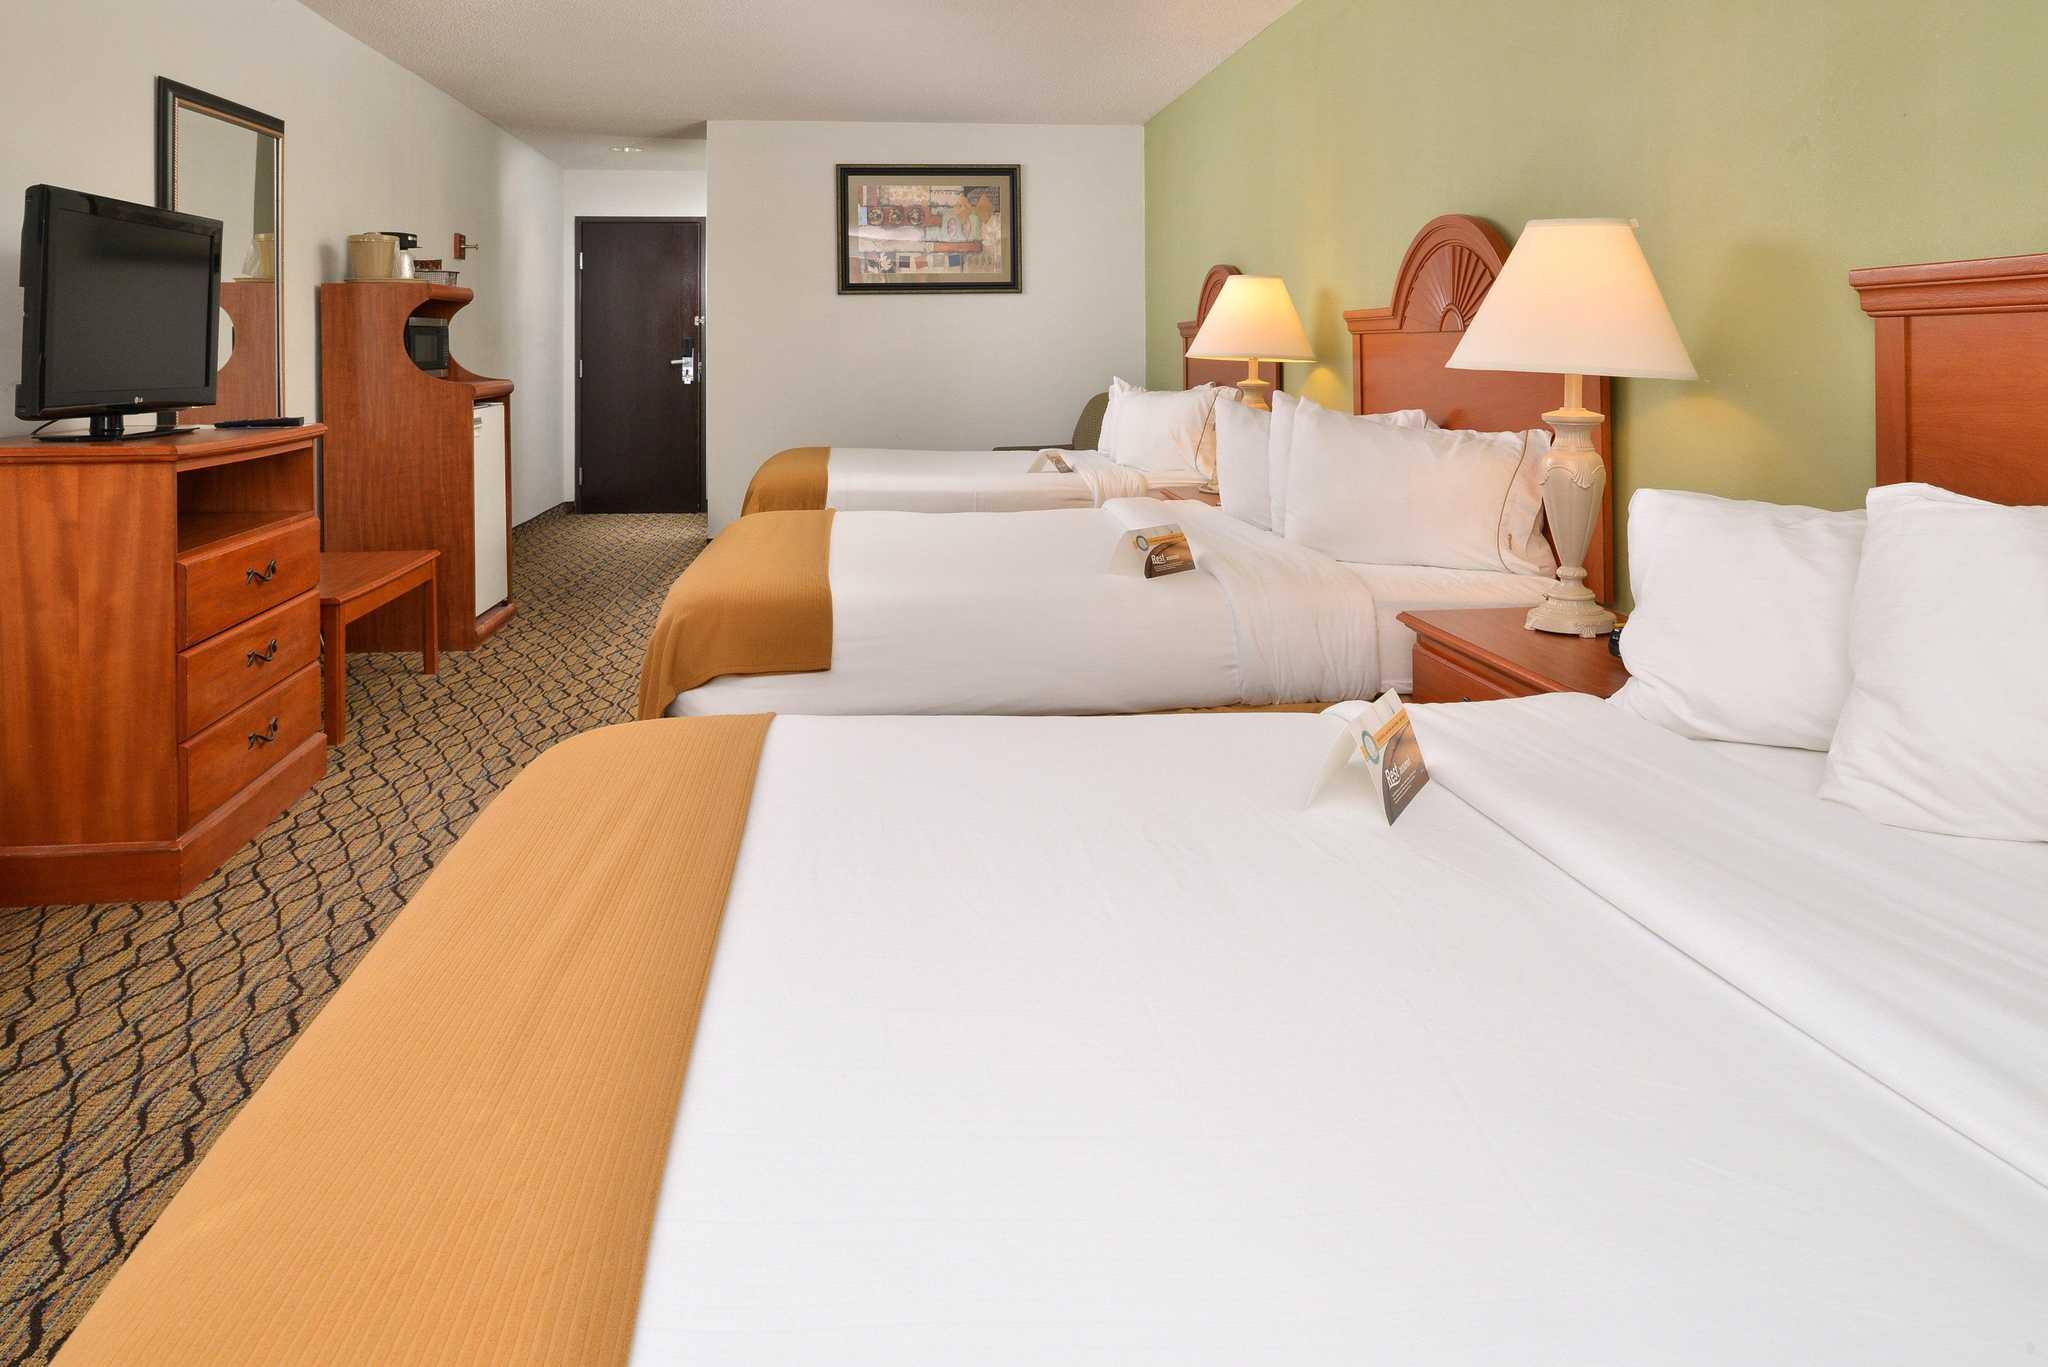 Quality Inn & Suites Jefferson City image 6